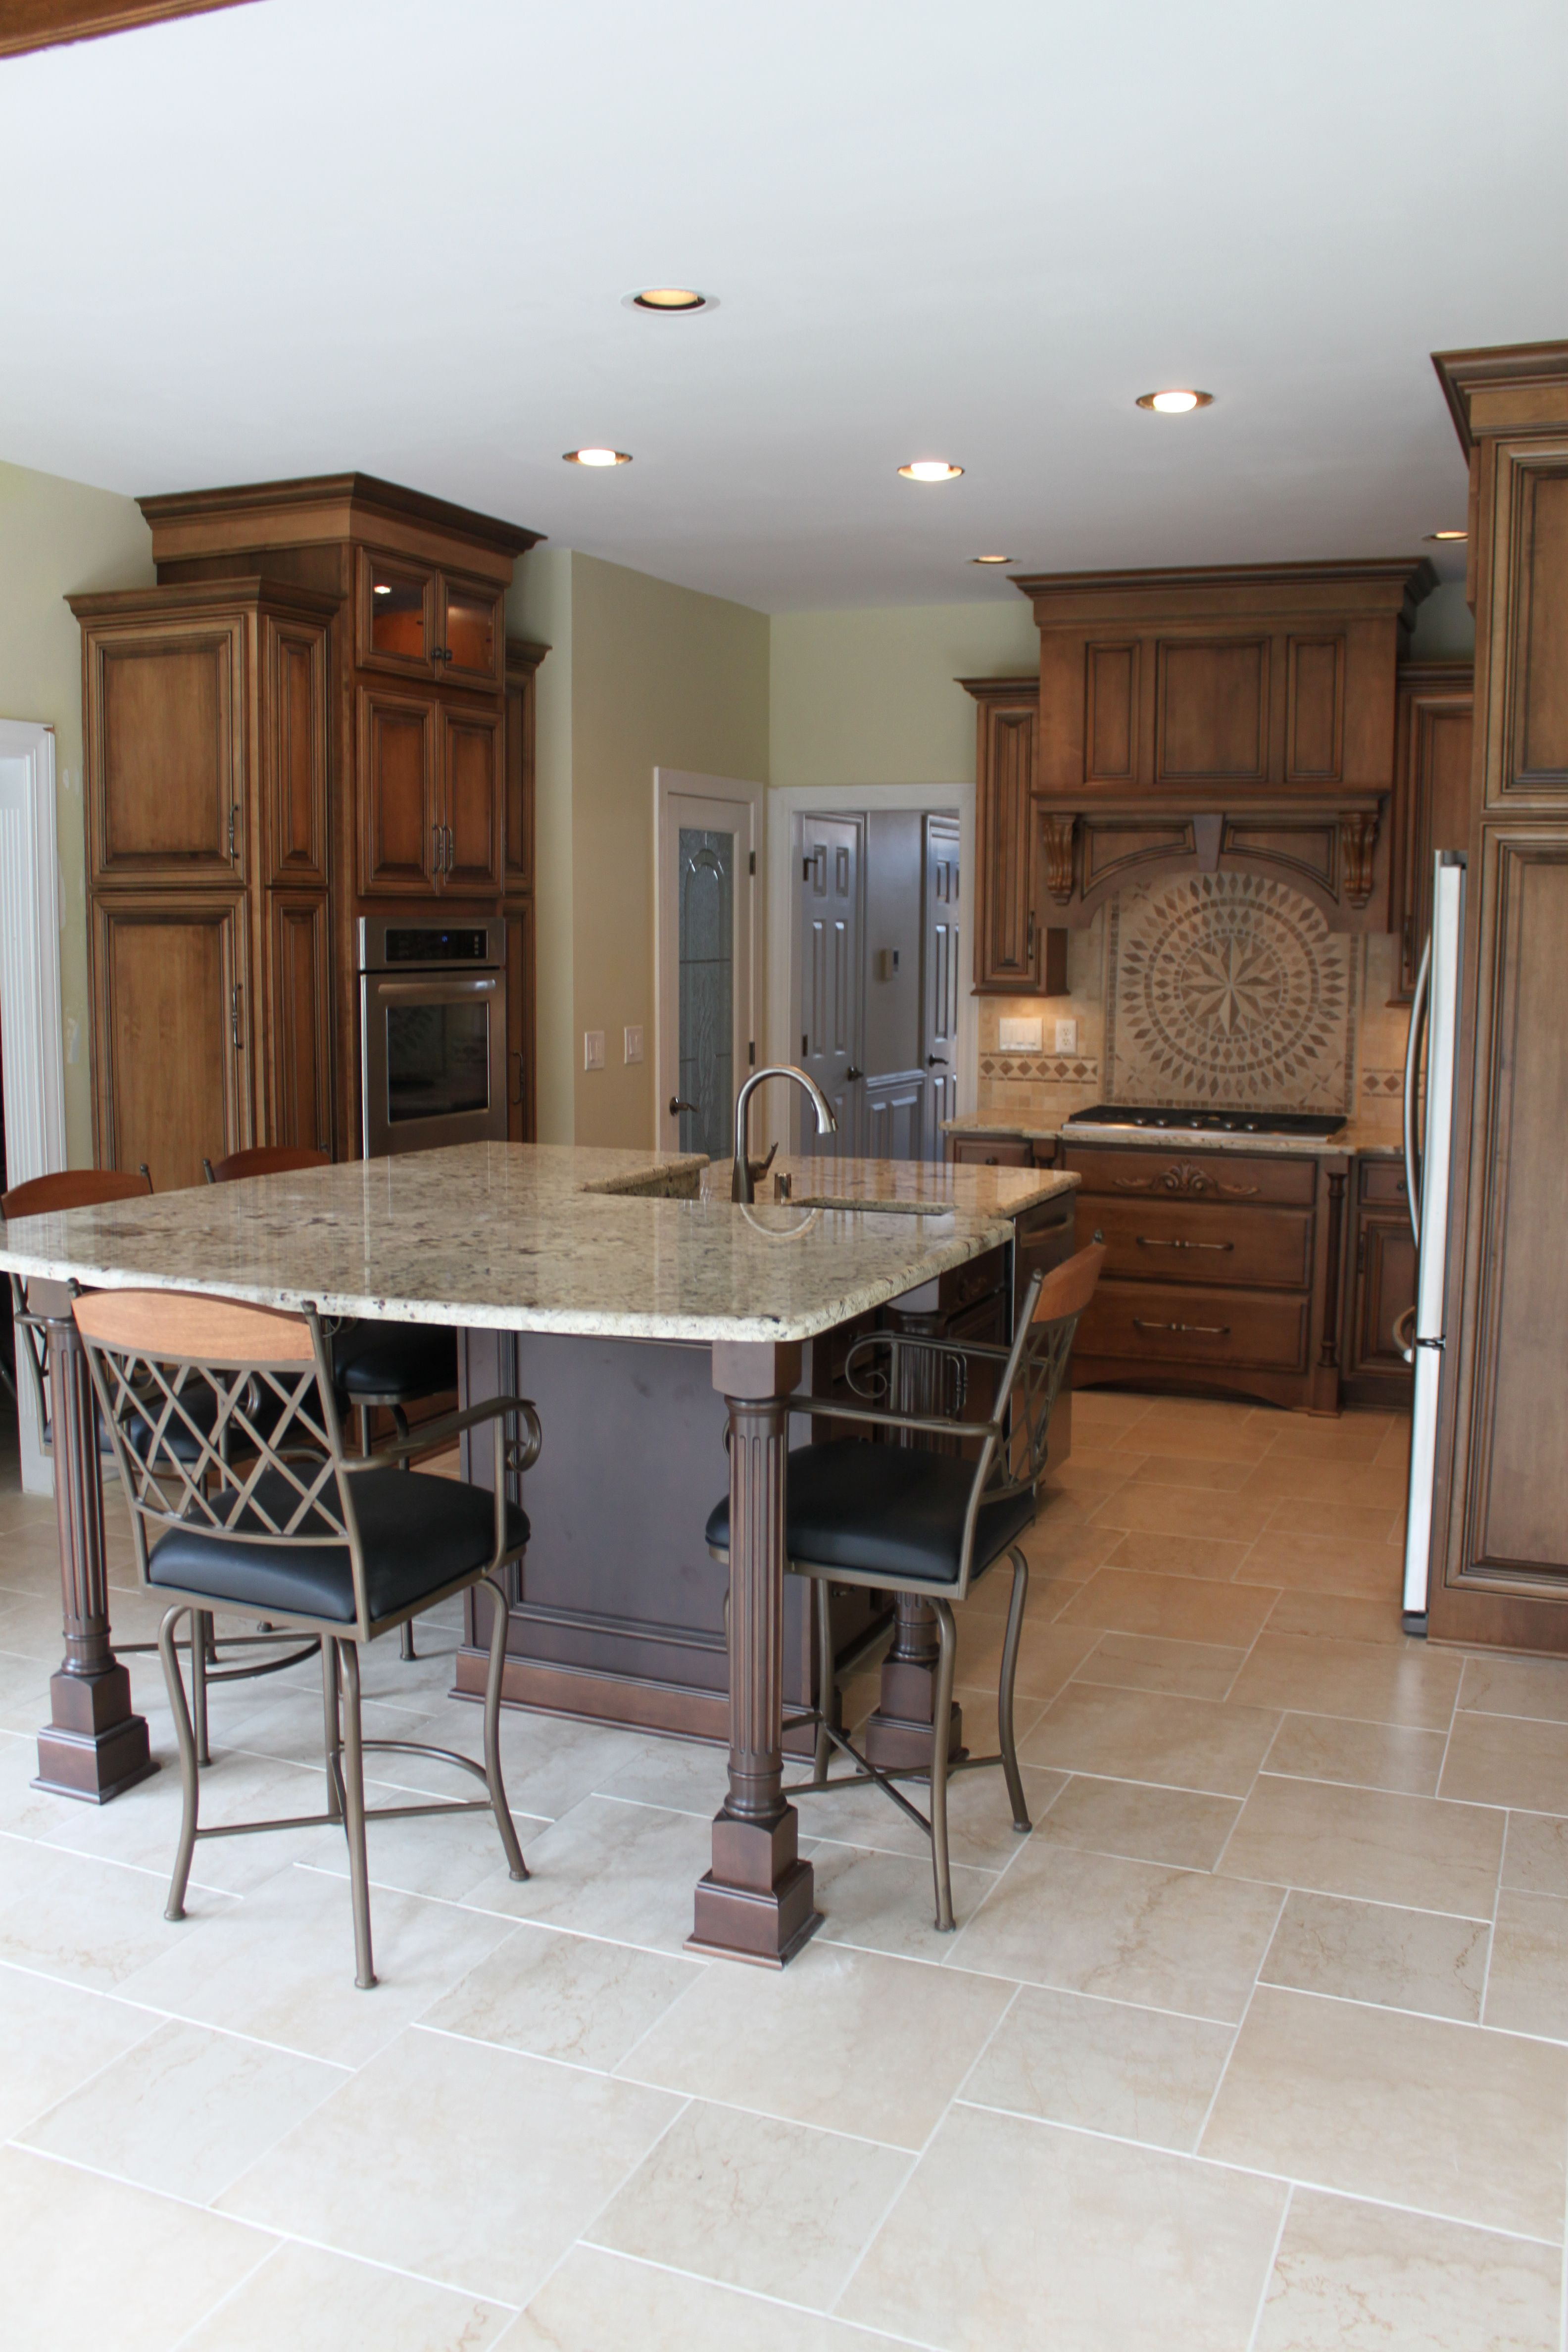 Superieur Shiloh Cabinetry. Maple Acorn With Vandyke Glaze On Perimeter, Maple Sable  With Black Glaze